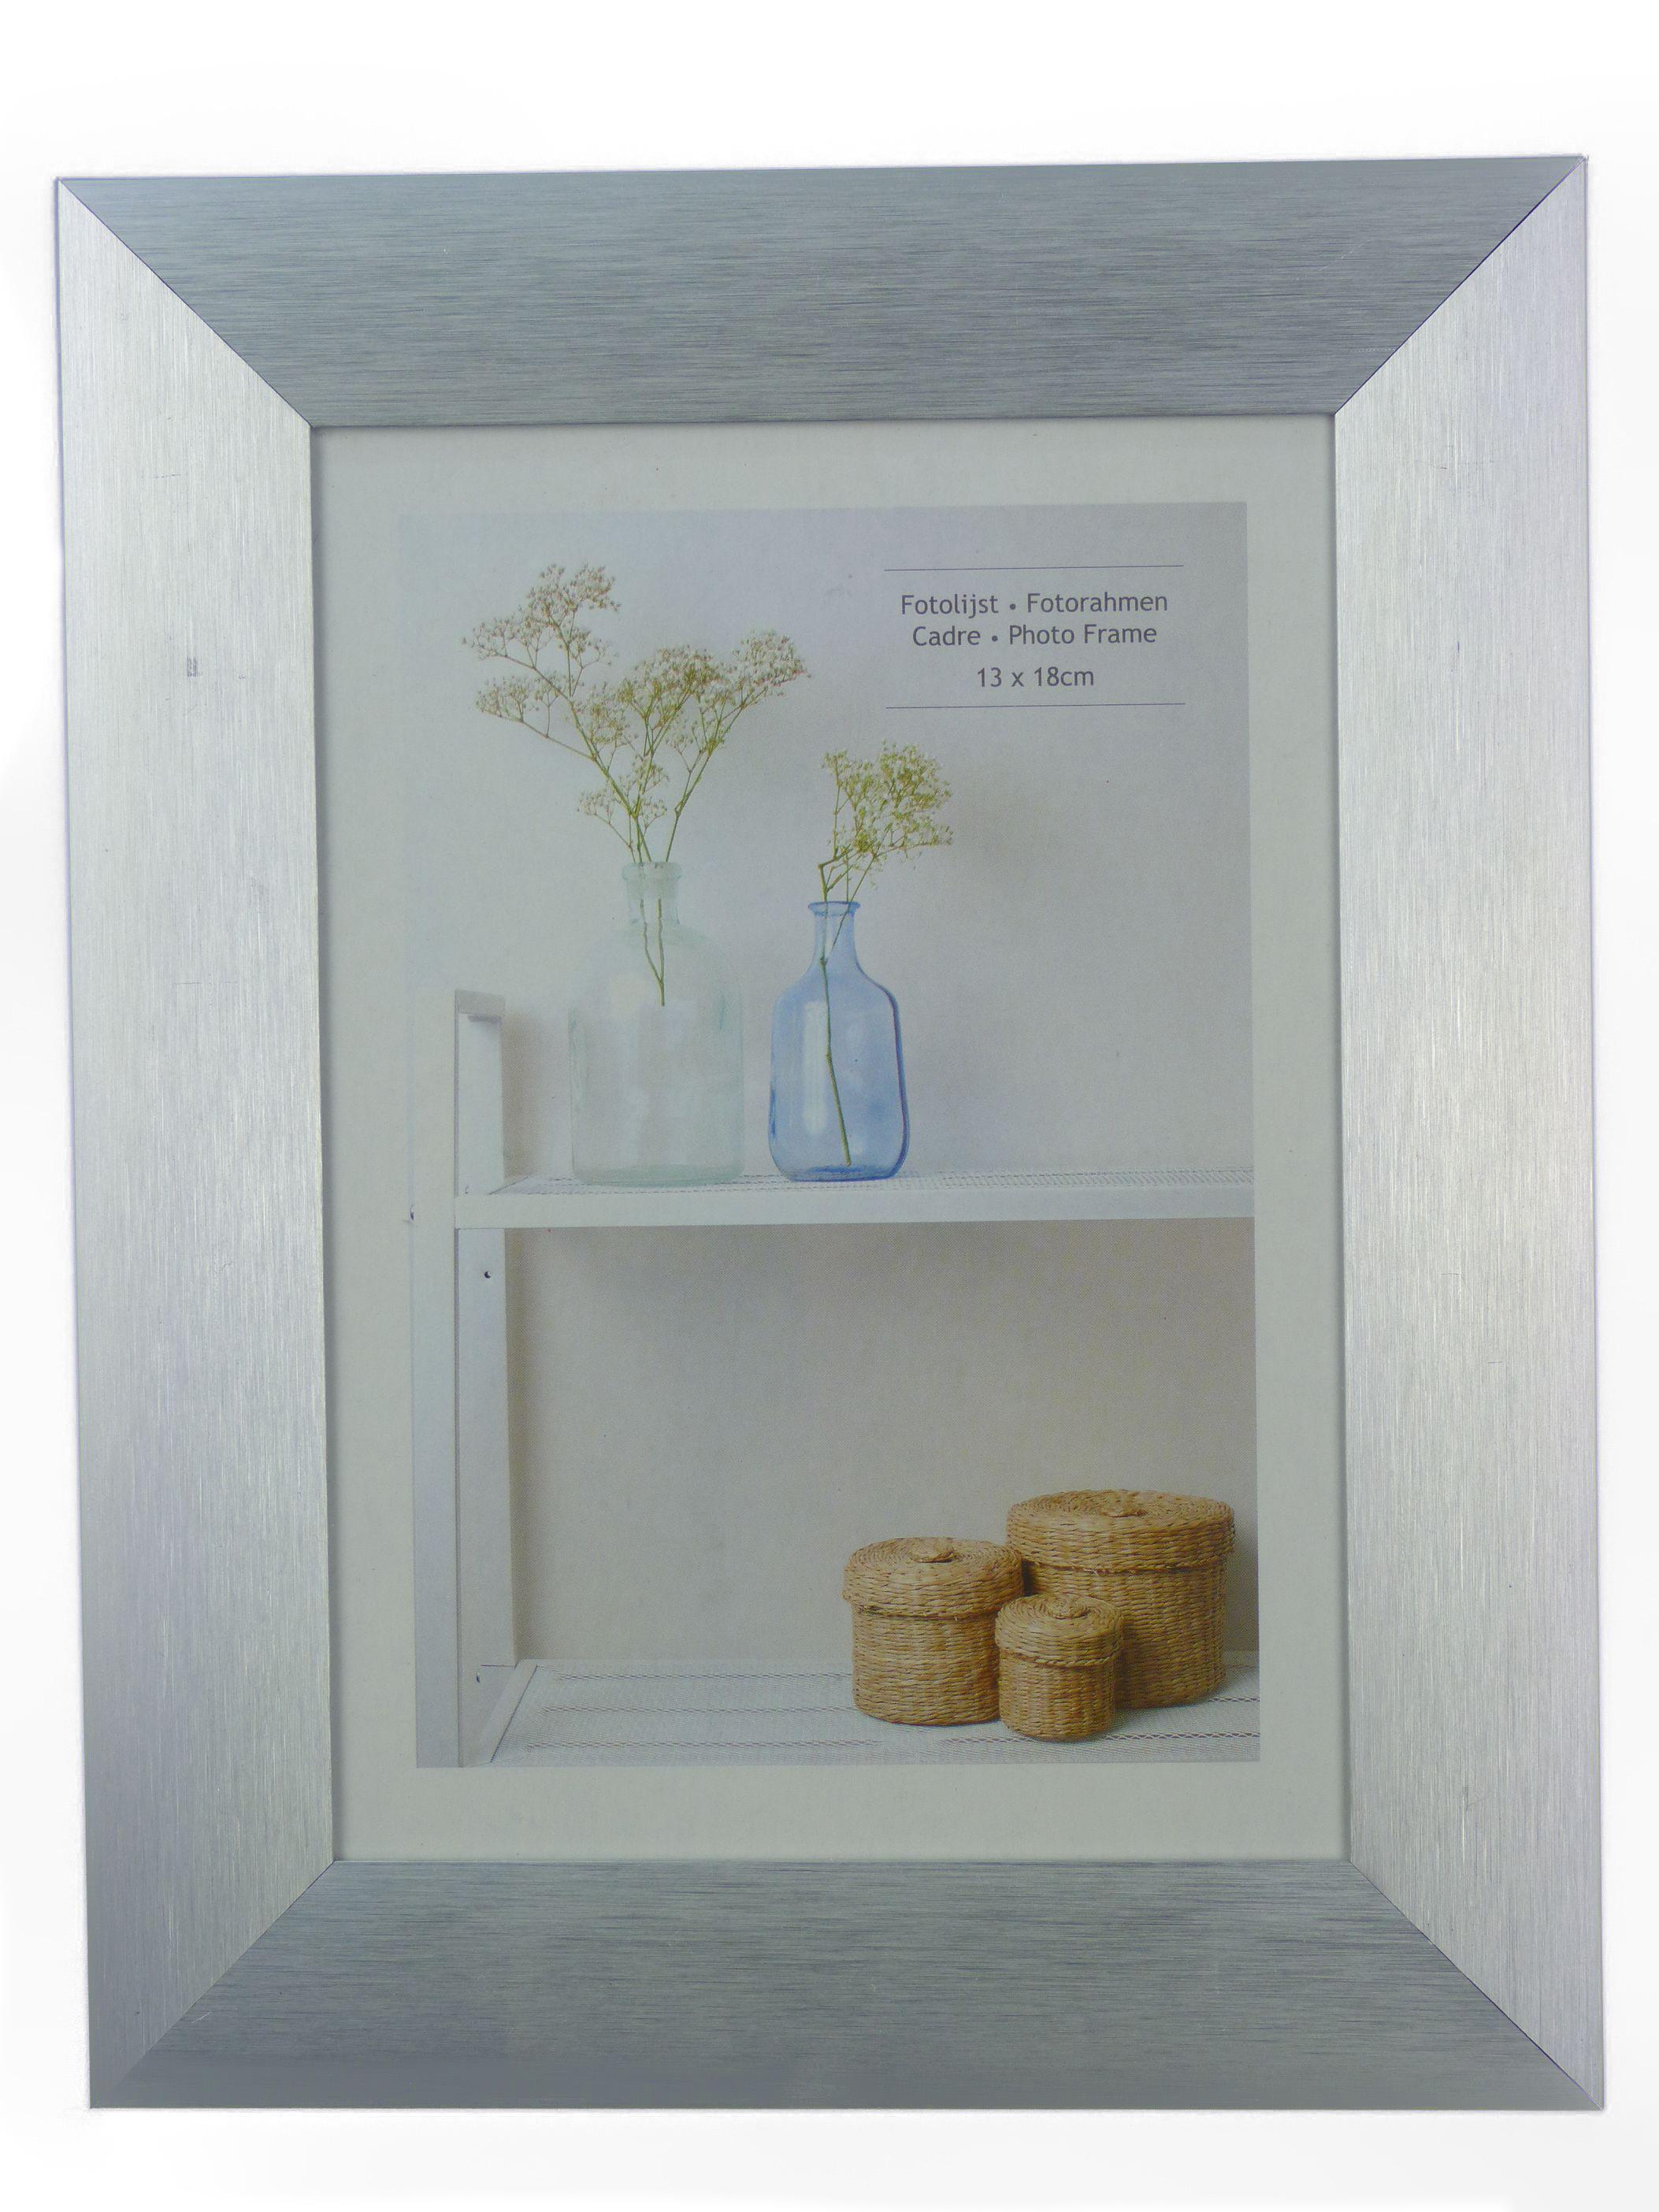 bilderrahmen aluminium fotorahmen bilder fotos 10x15 und 13x18 cm silber rahmen ebay. Black Bedroom Furniture Sets. Home Design Ideas